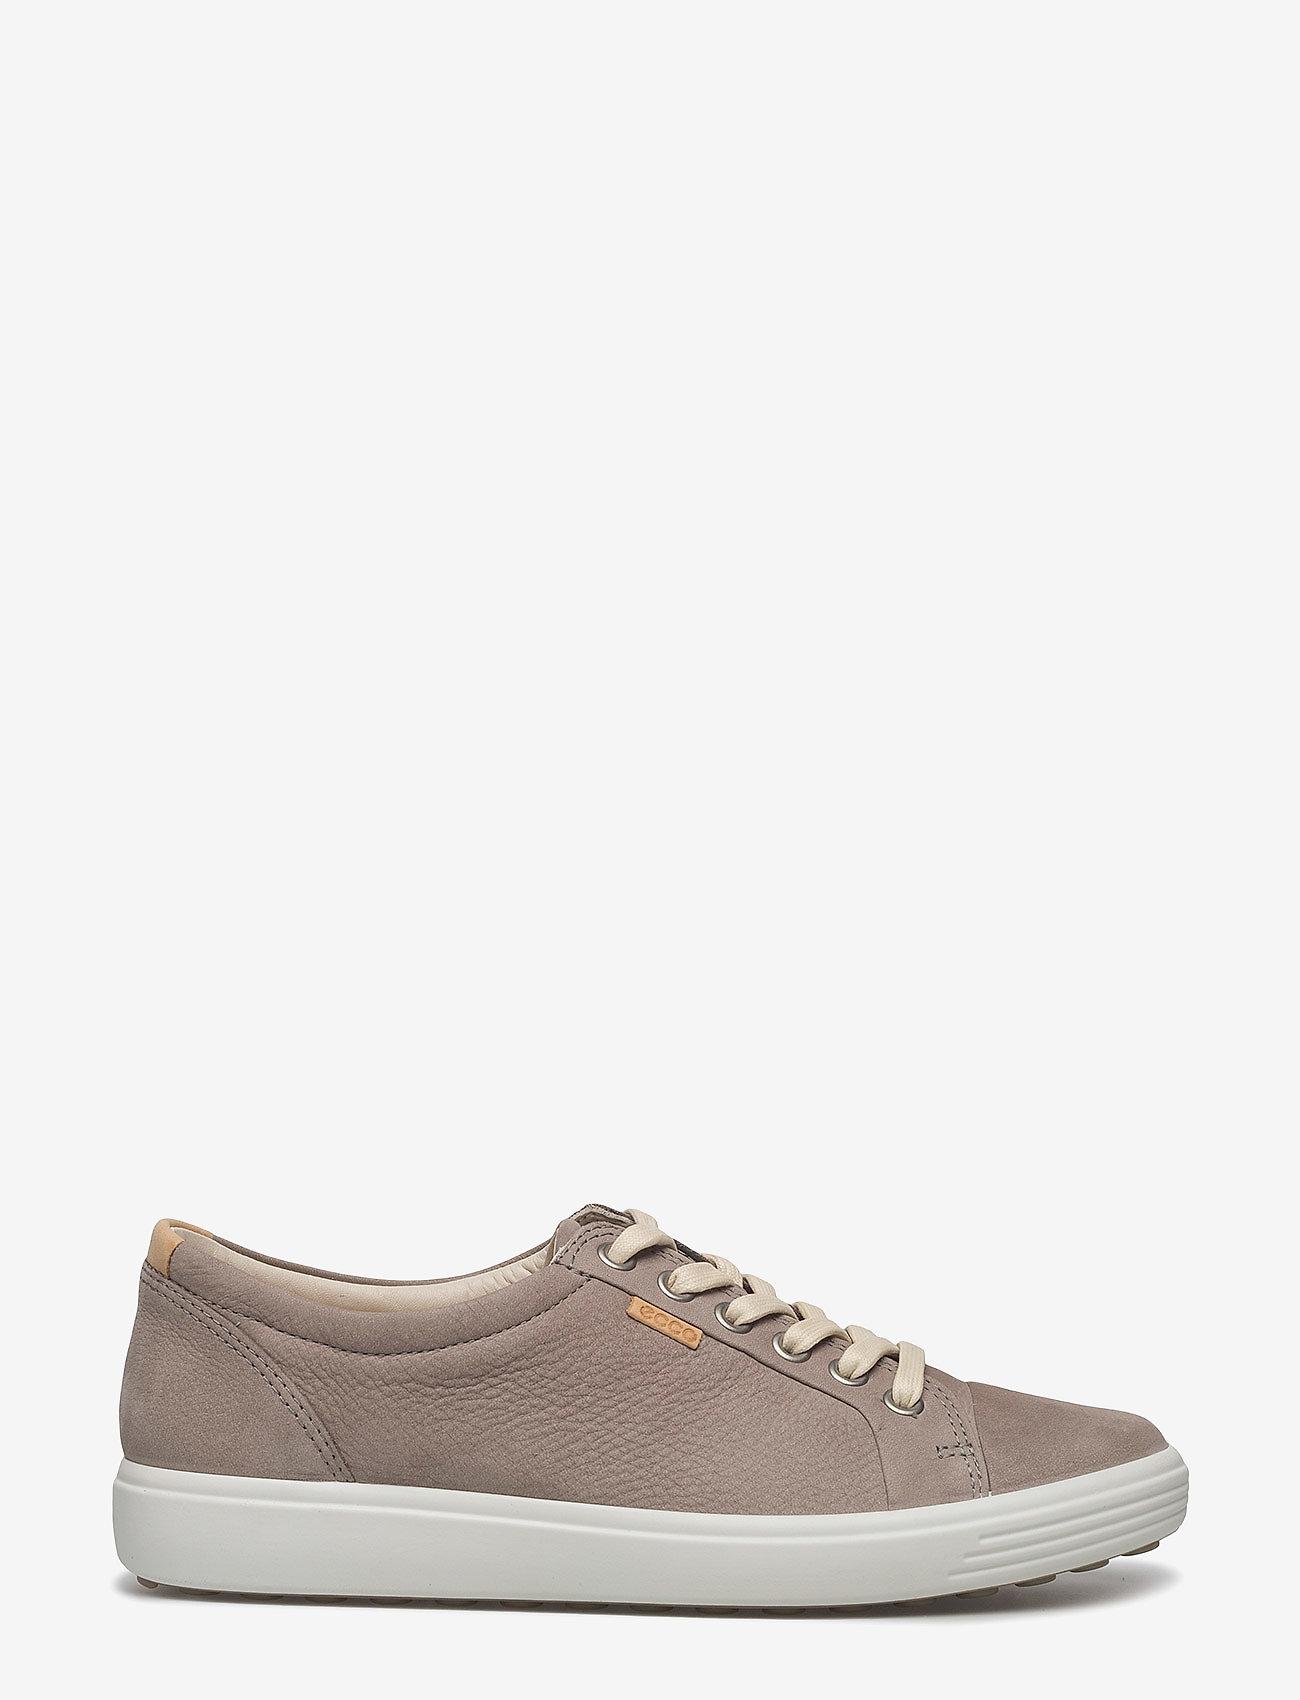 ECCO - SOFT 7 W - låga sneakers - warm grey - 1